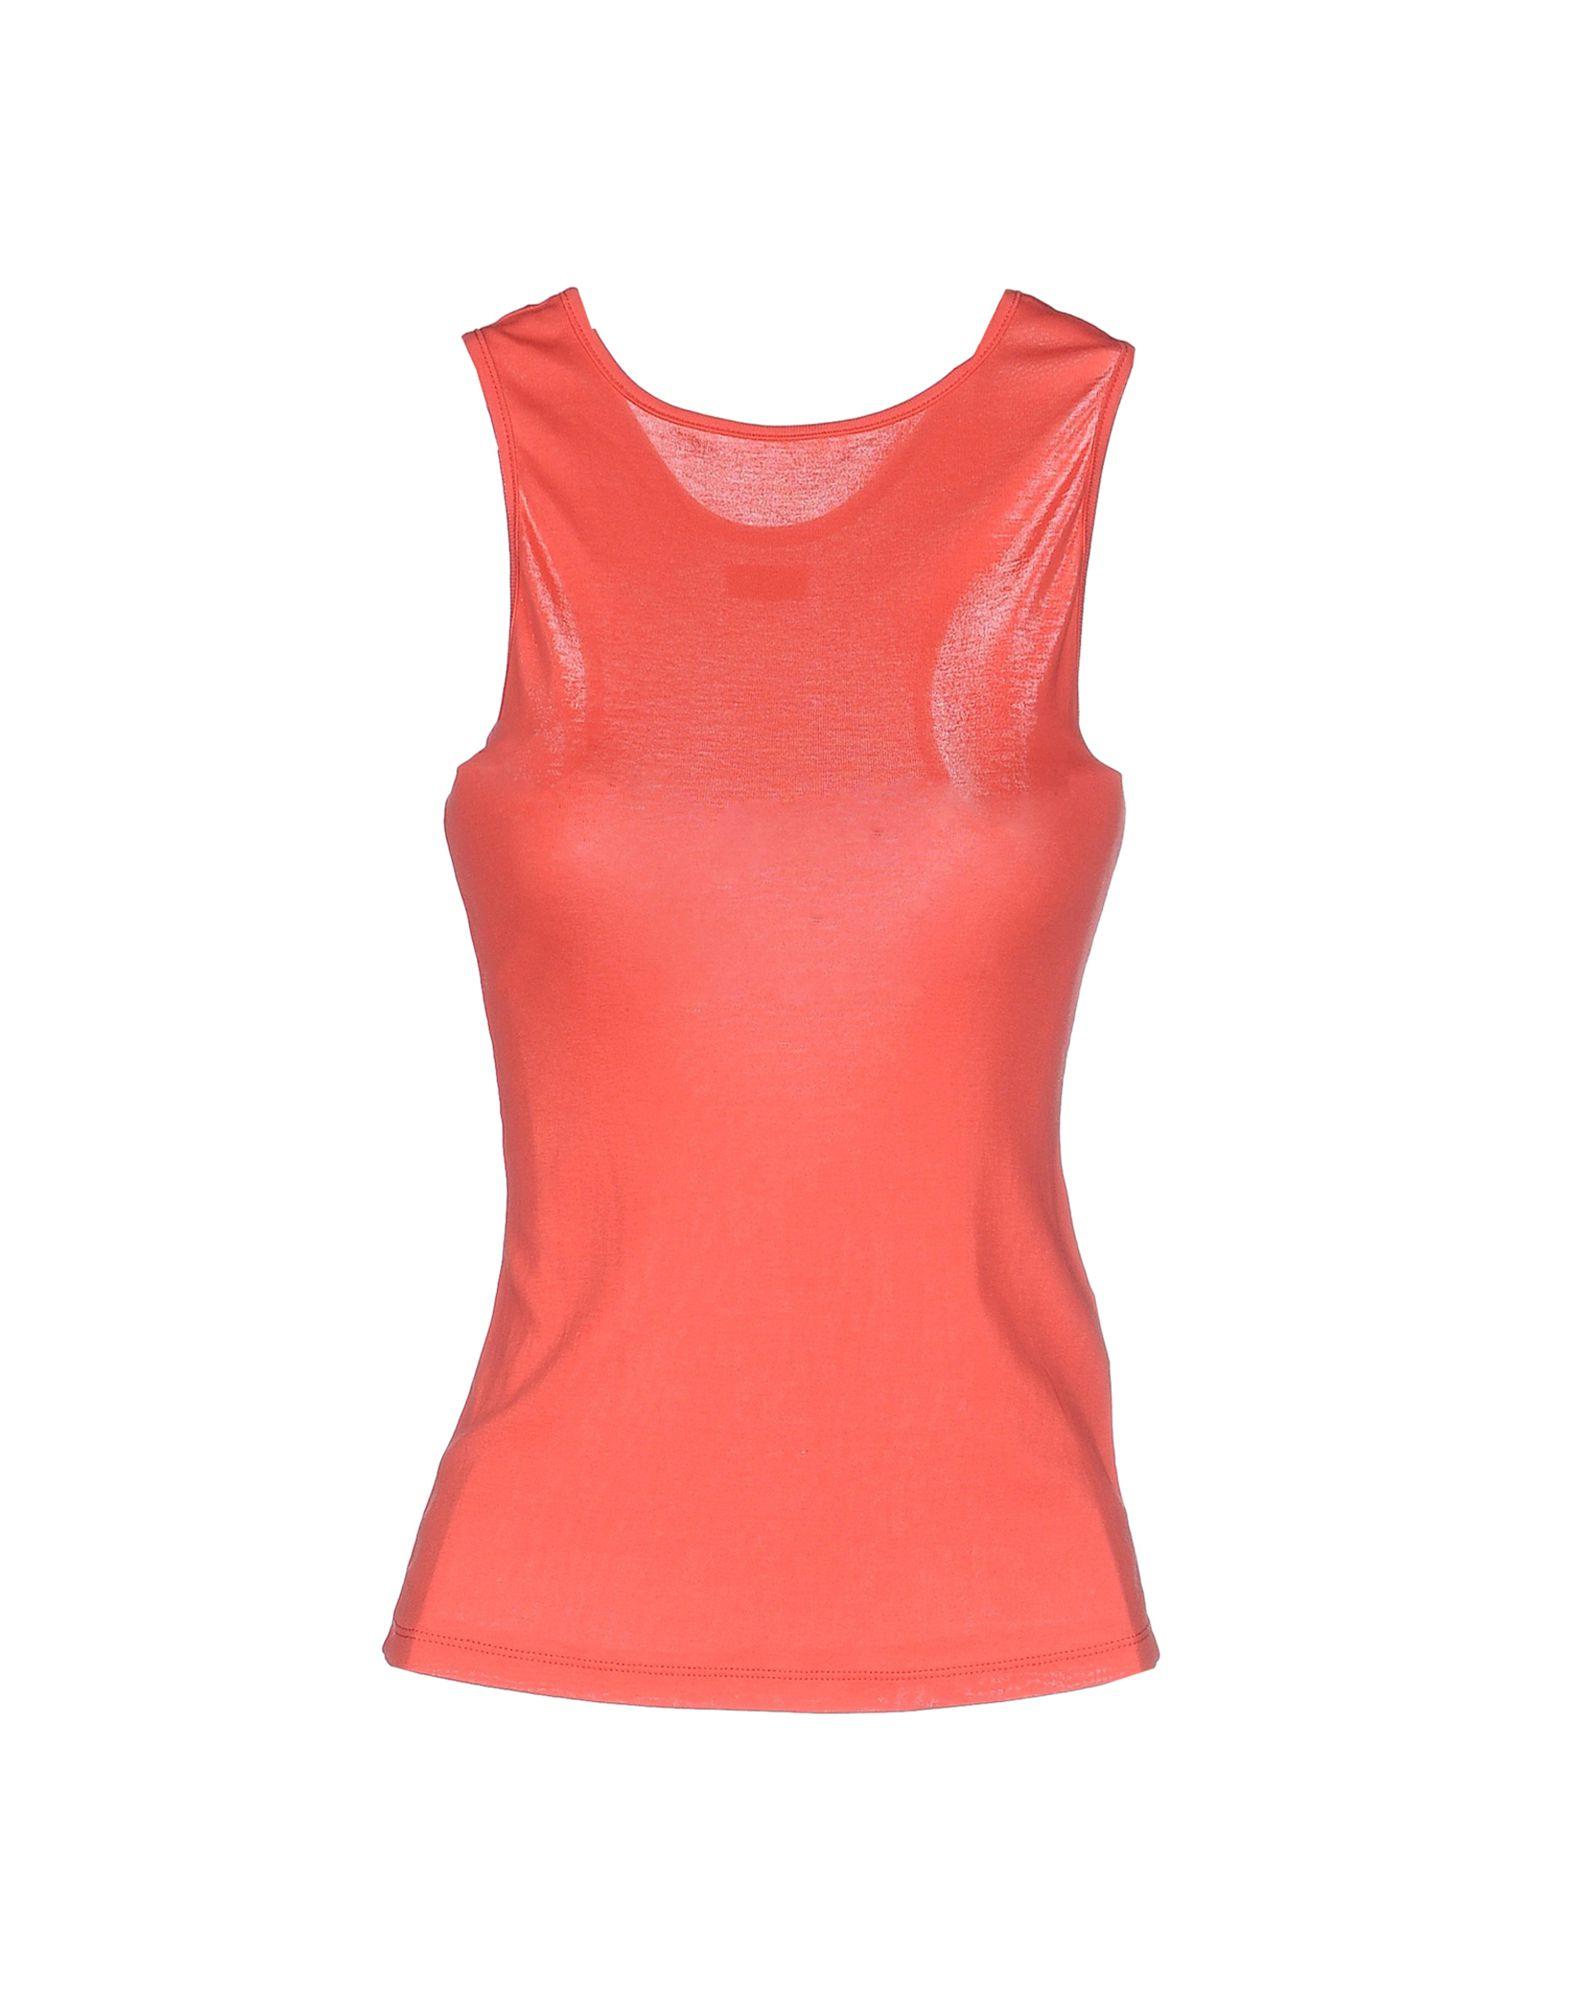 Intropia Tank Top in Pink